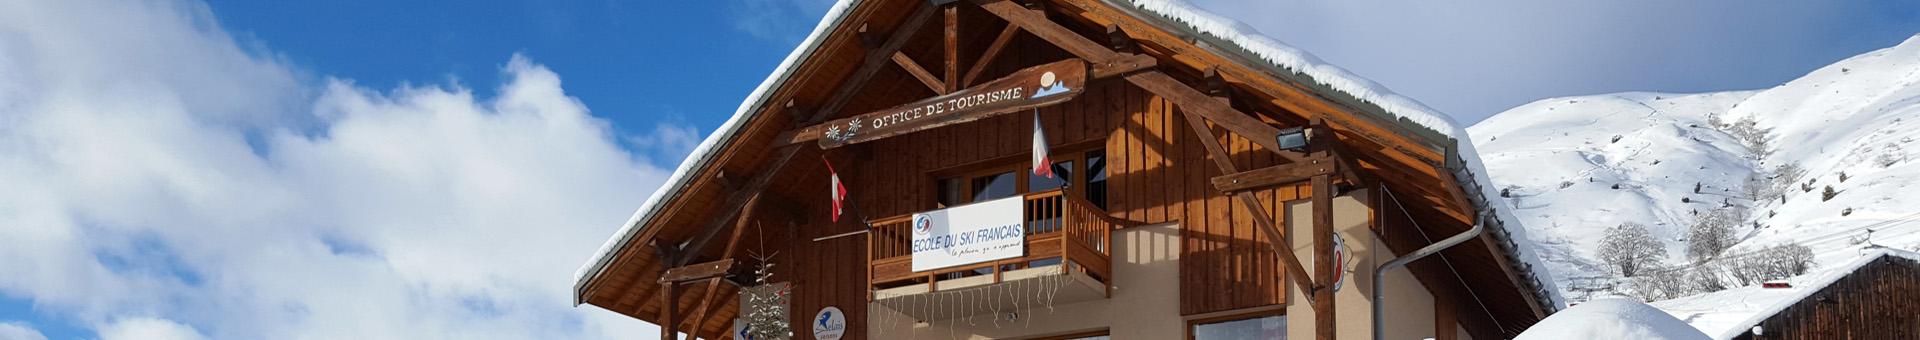 Winter Saint Jean d'Arves Visitor Centre